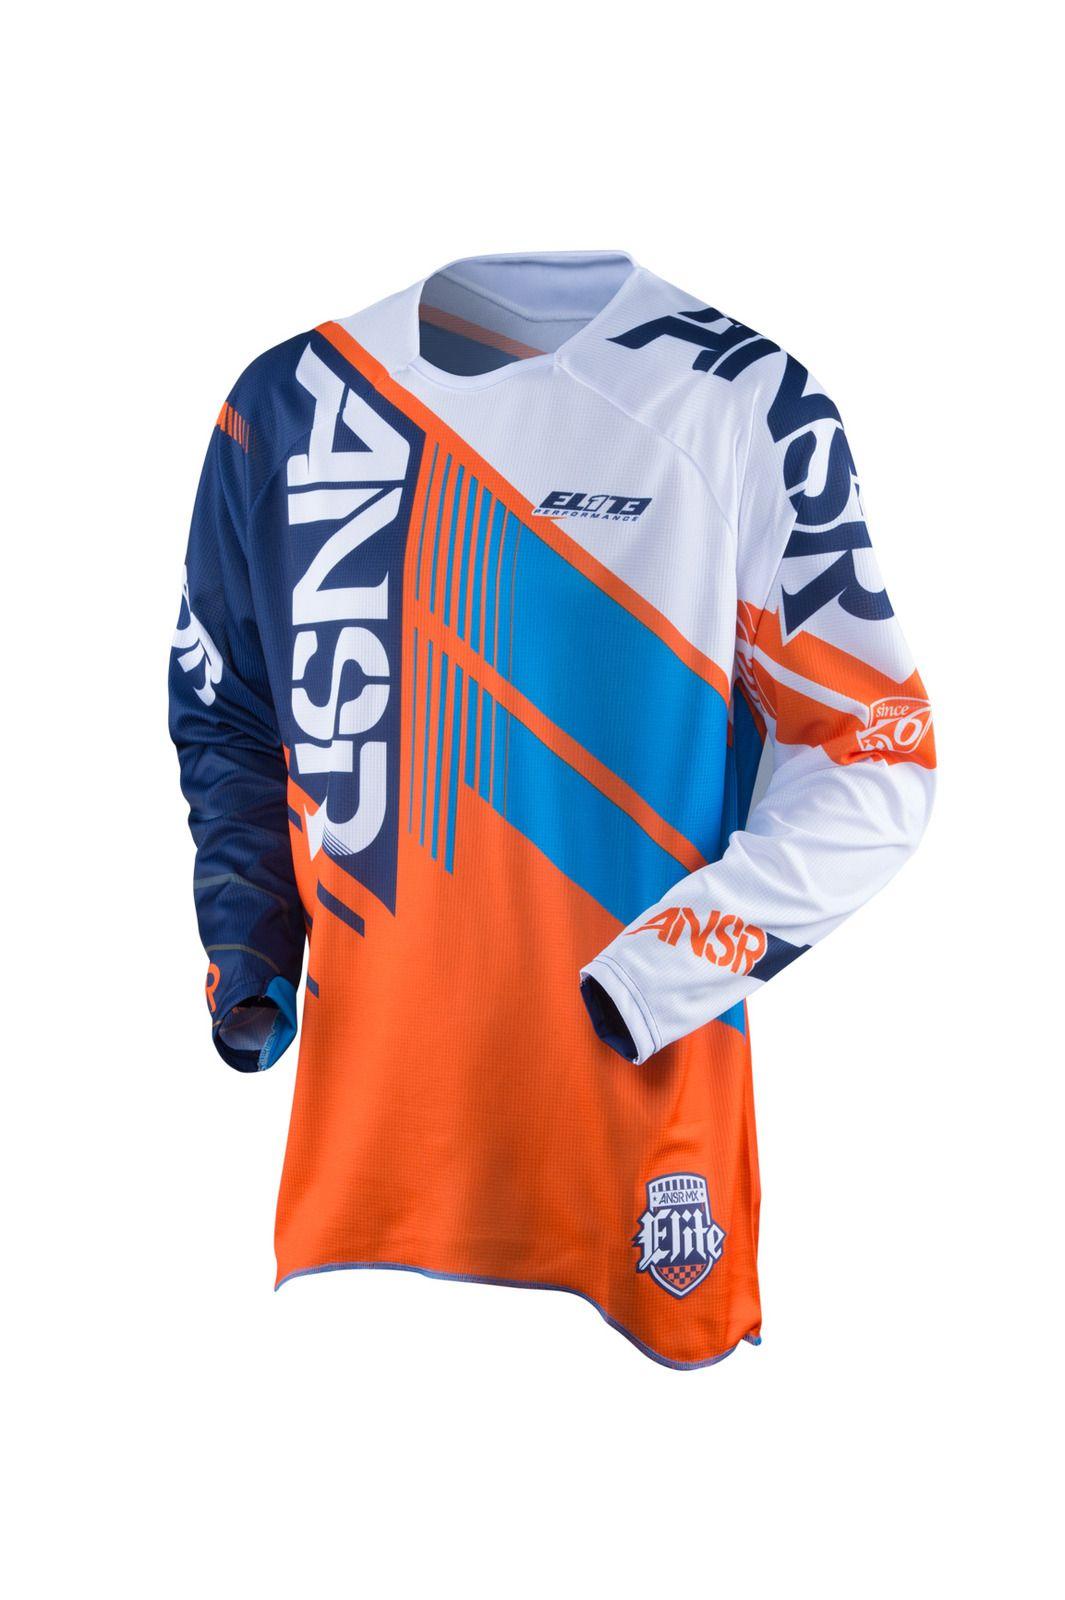 Download Answer 2016 Elite Orange Cyan White Jersey White Jersey Sport Outfits Elite